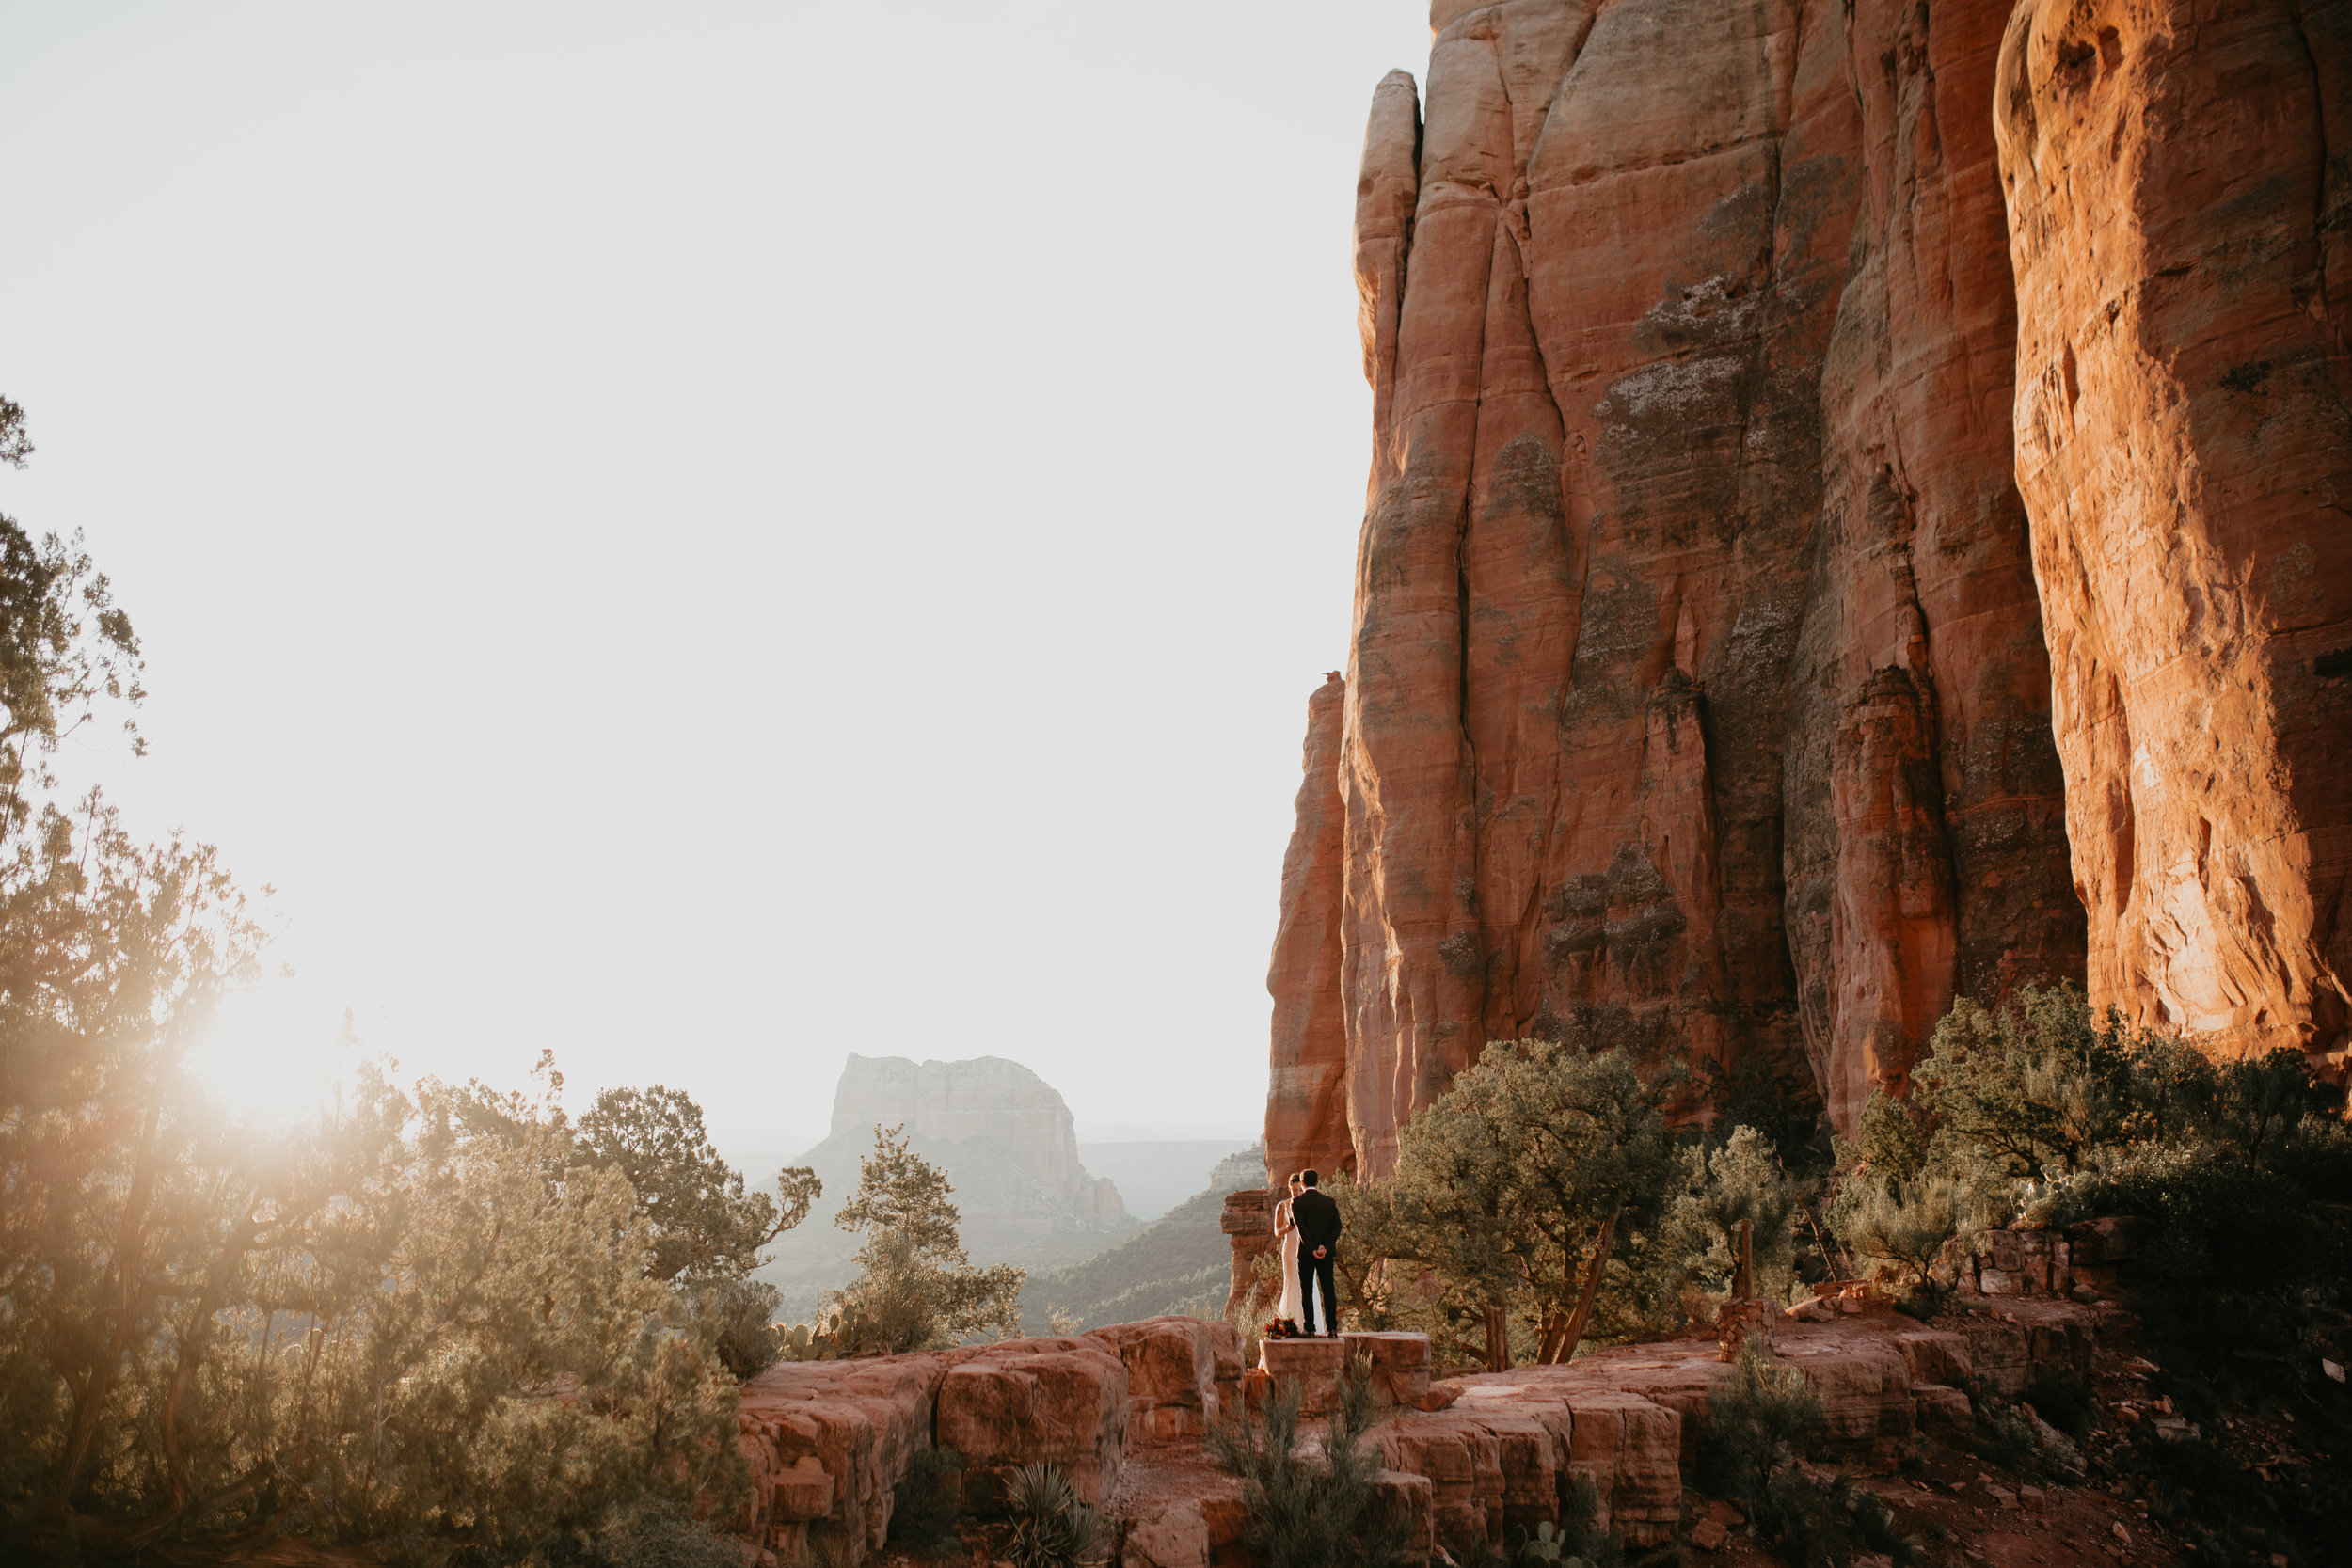 nicole-daacke-photography-sedona-arizona-destination-elopement-wedding-photographer-catherdral-rock-hiking-elopement-sedona-river-elopement-photos-desert-rock-wedding-photographer-laid-back-spontaneous-elopement-43.jpg